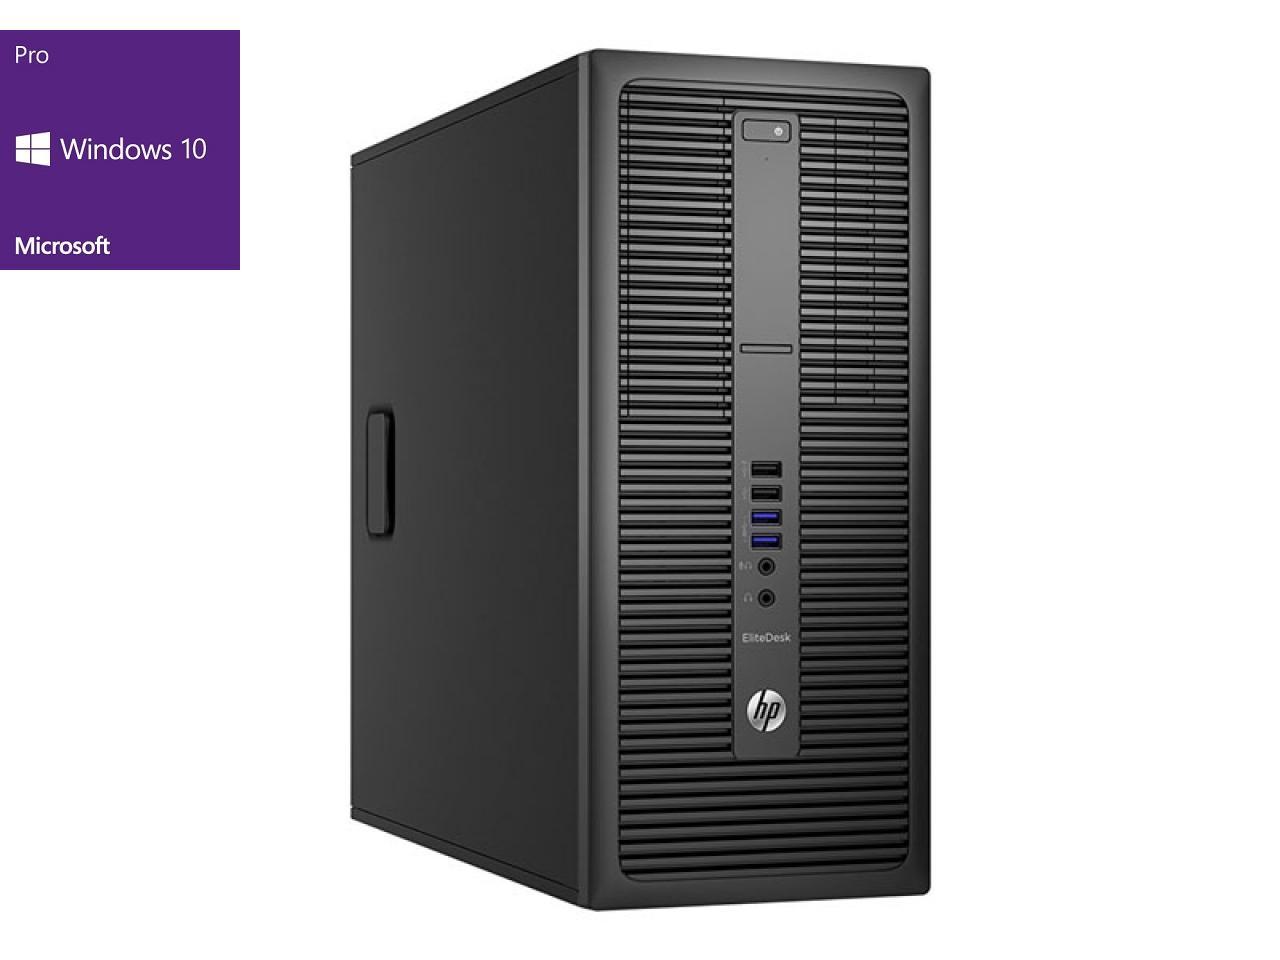 Hewlett Packard EliteDesk 800 G2 T